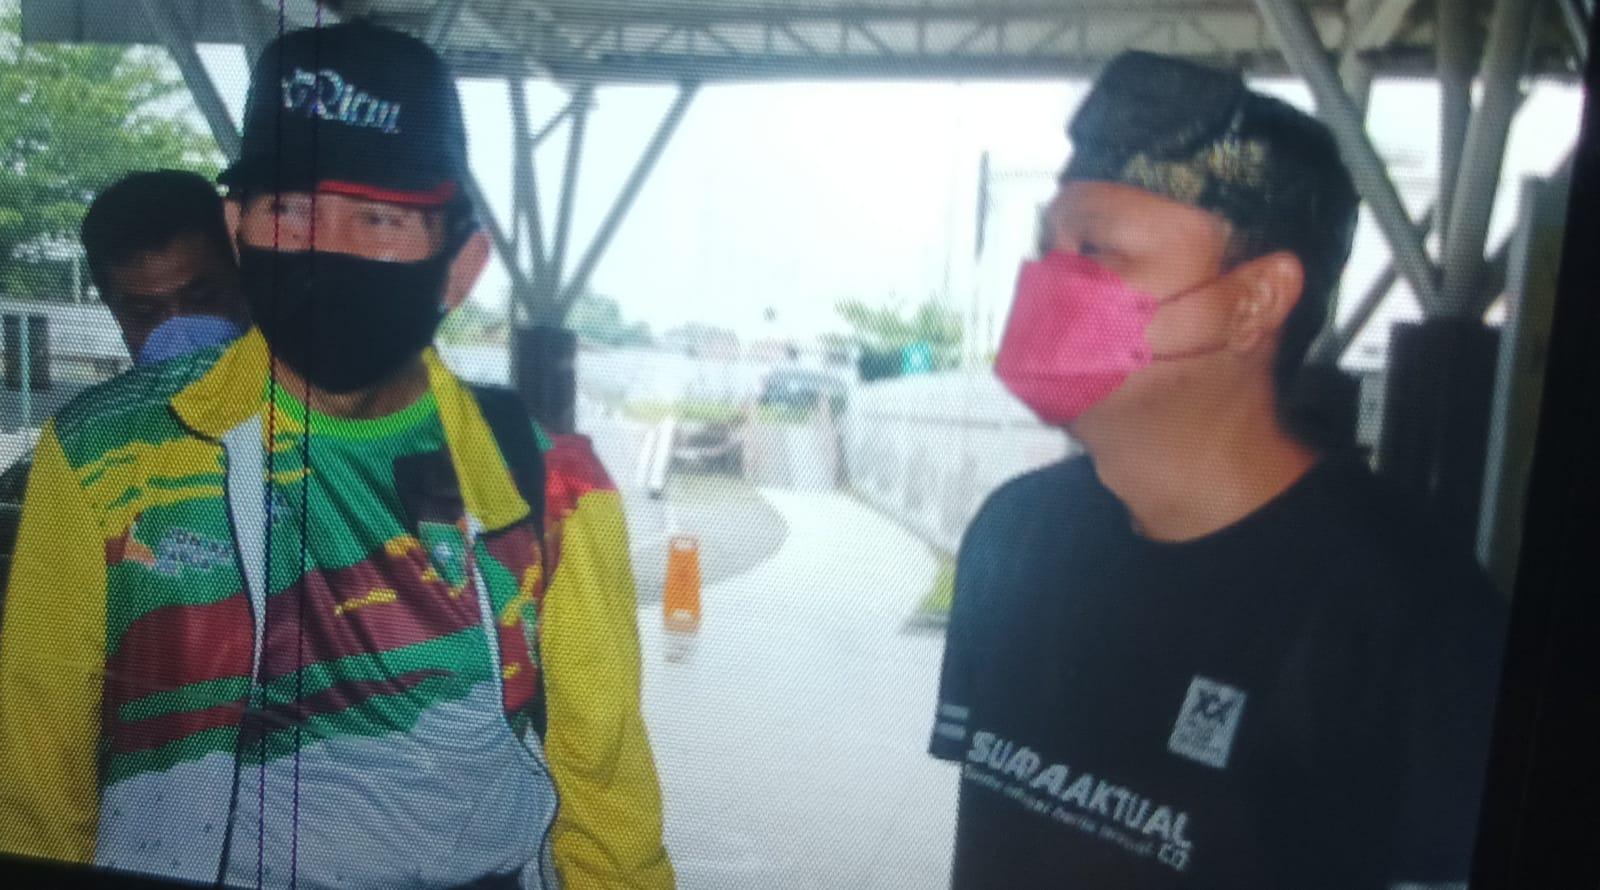 Ketua FPR,Doakan dan Saksikan Keberangkatan Atlet dan Pengurus KONI Riau Ke Papua